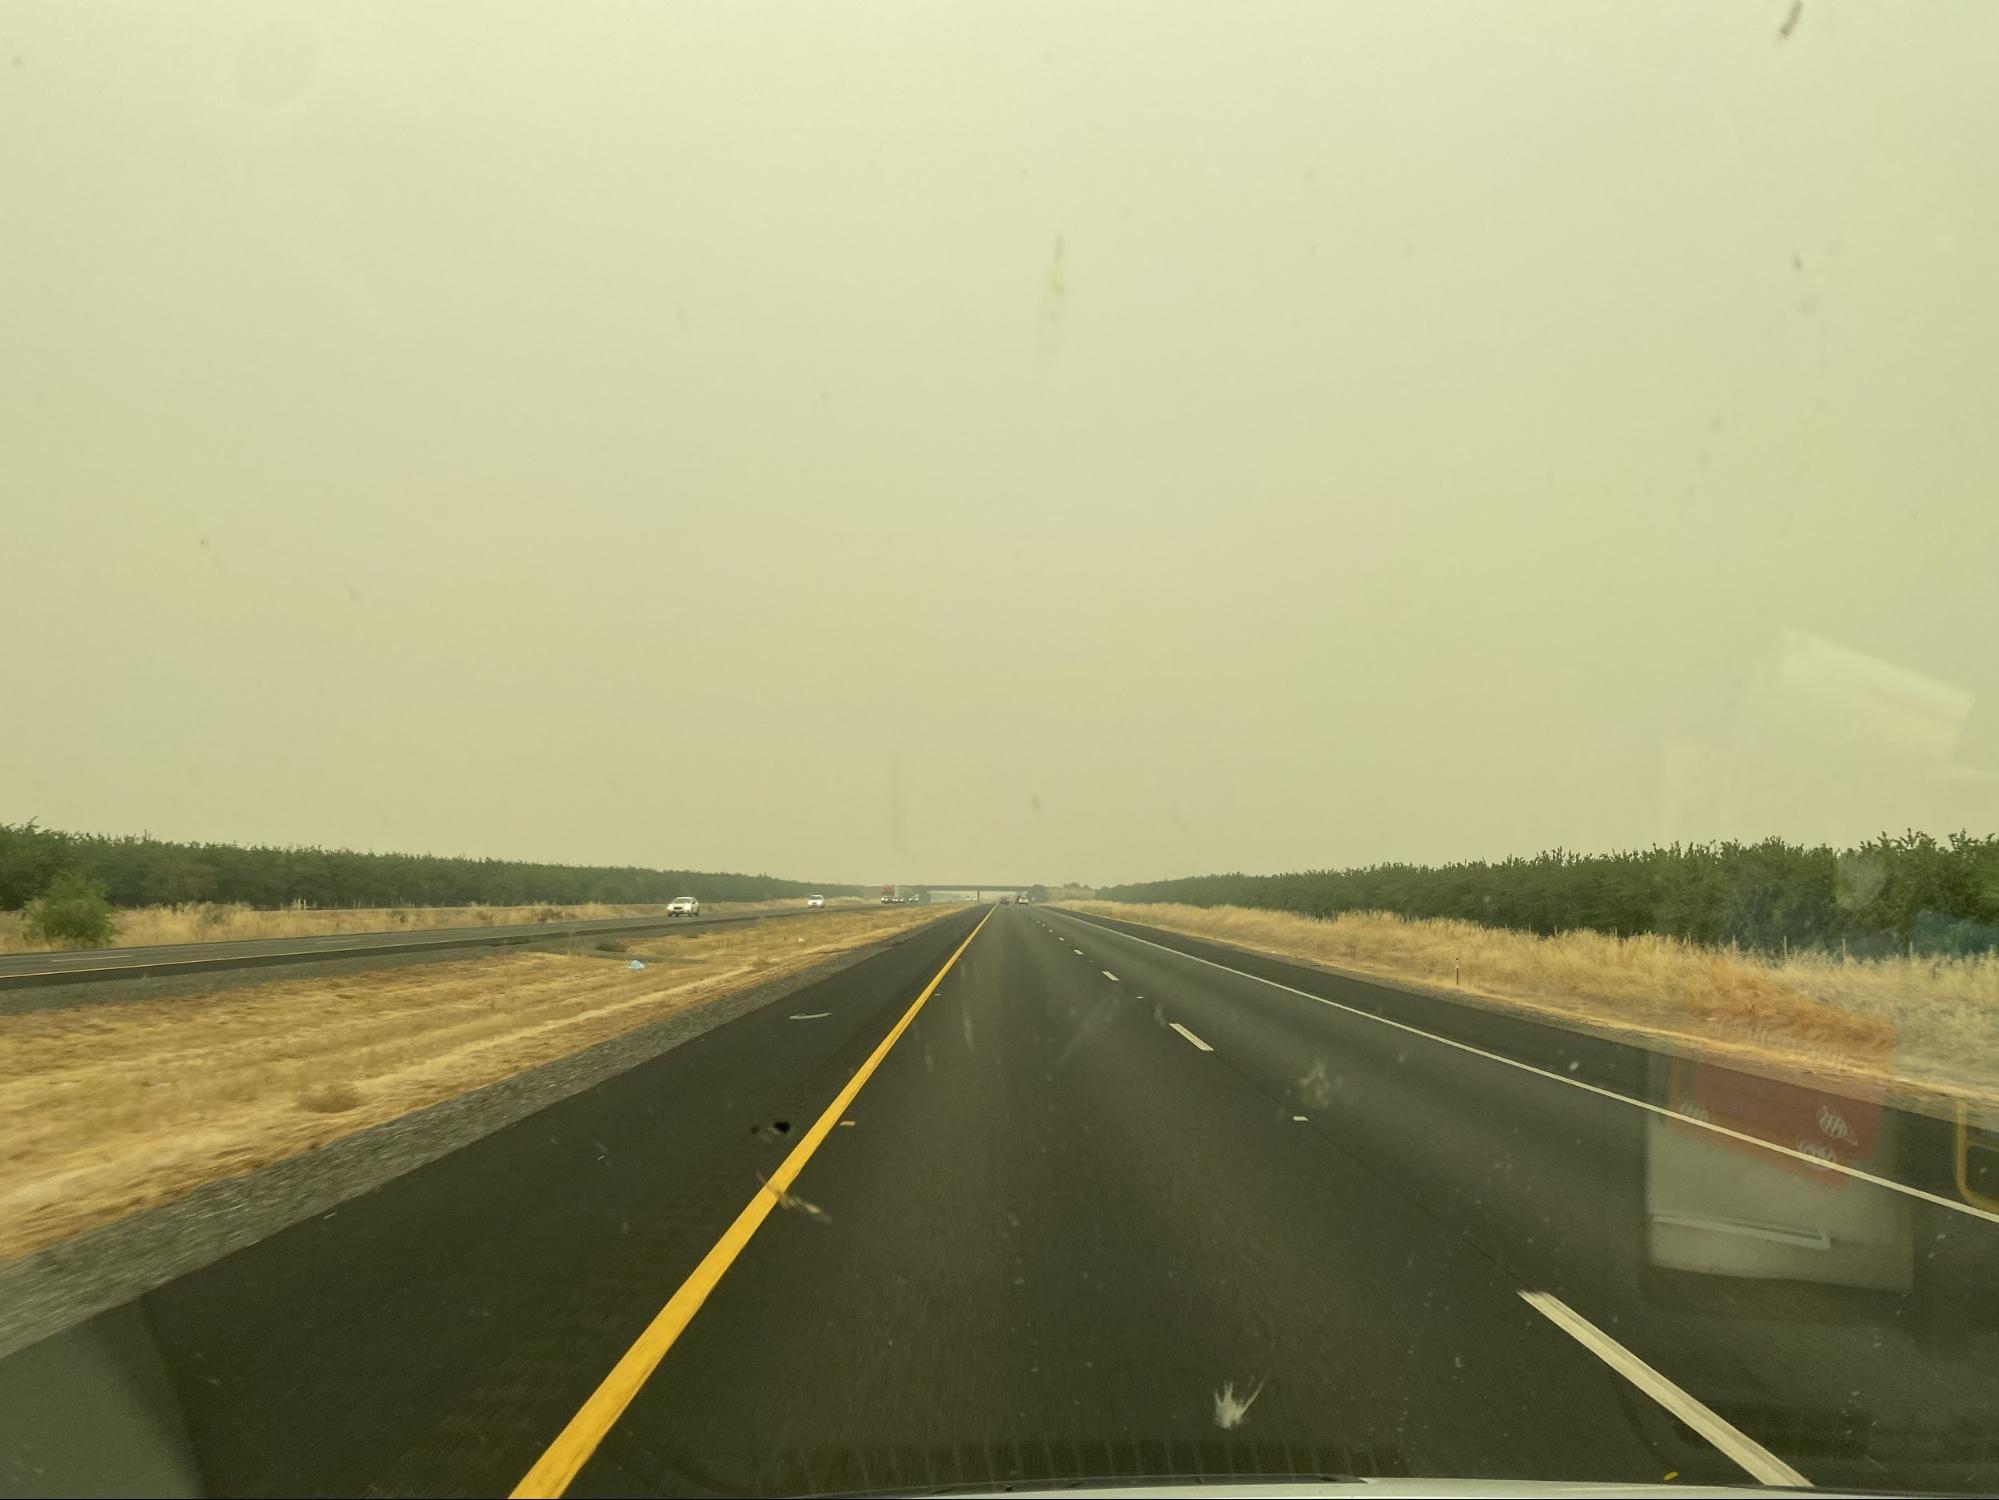 Smoky skies across Northern, CA.